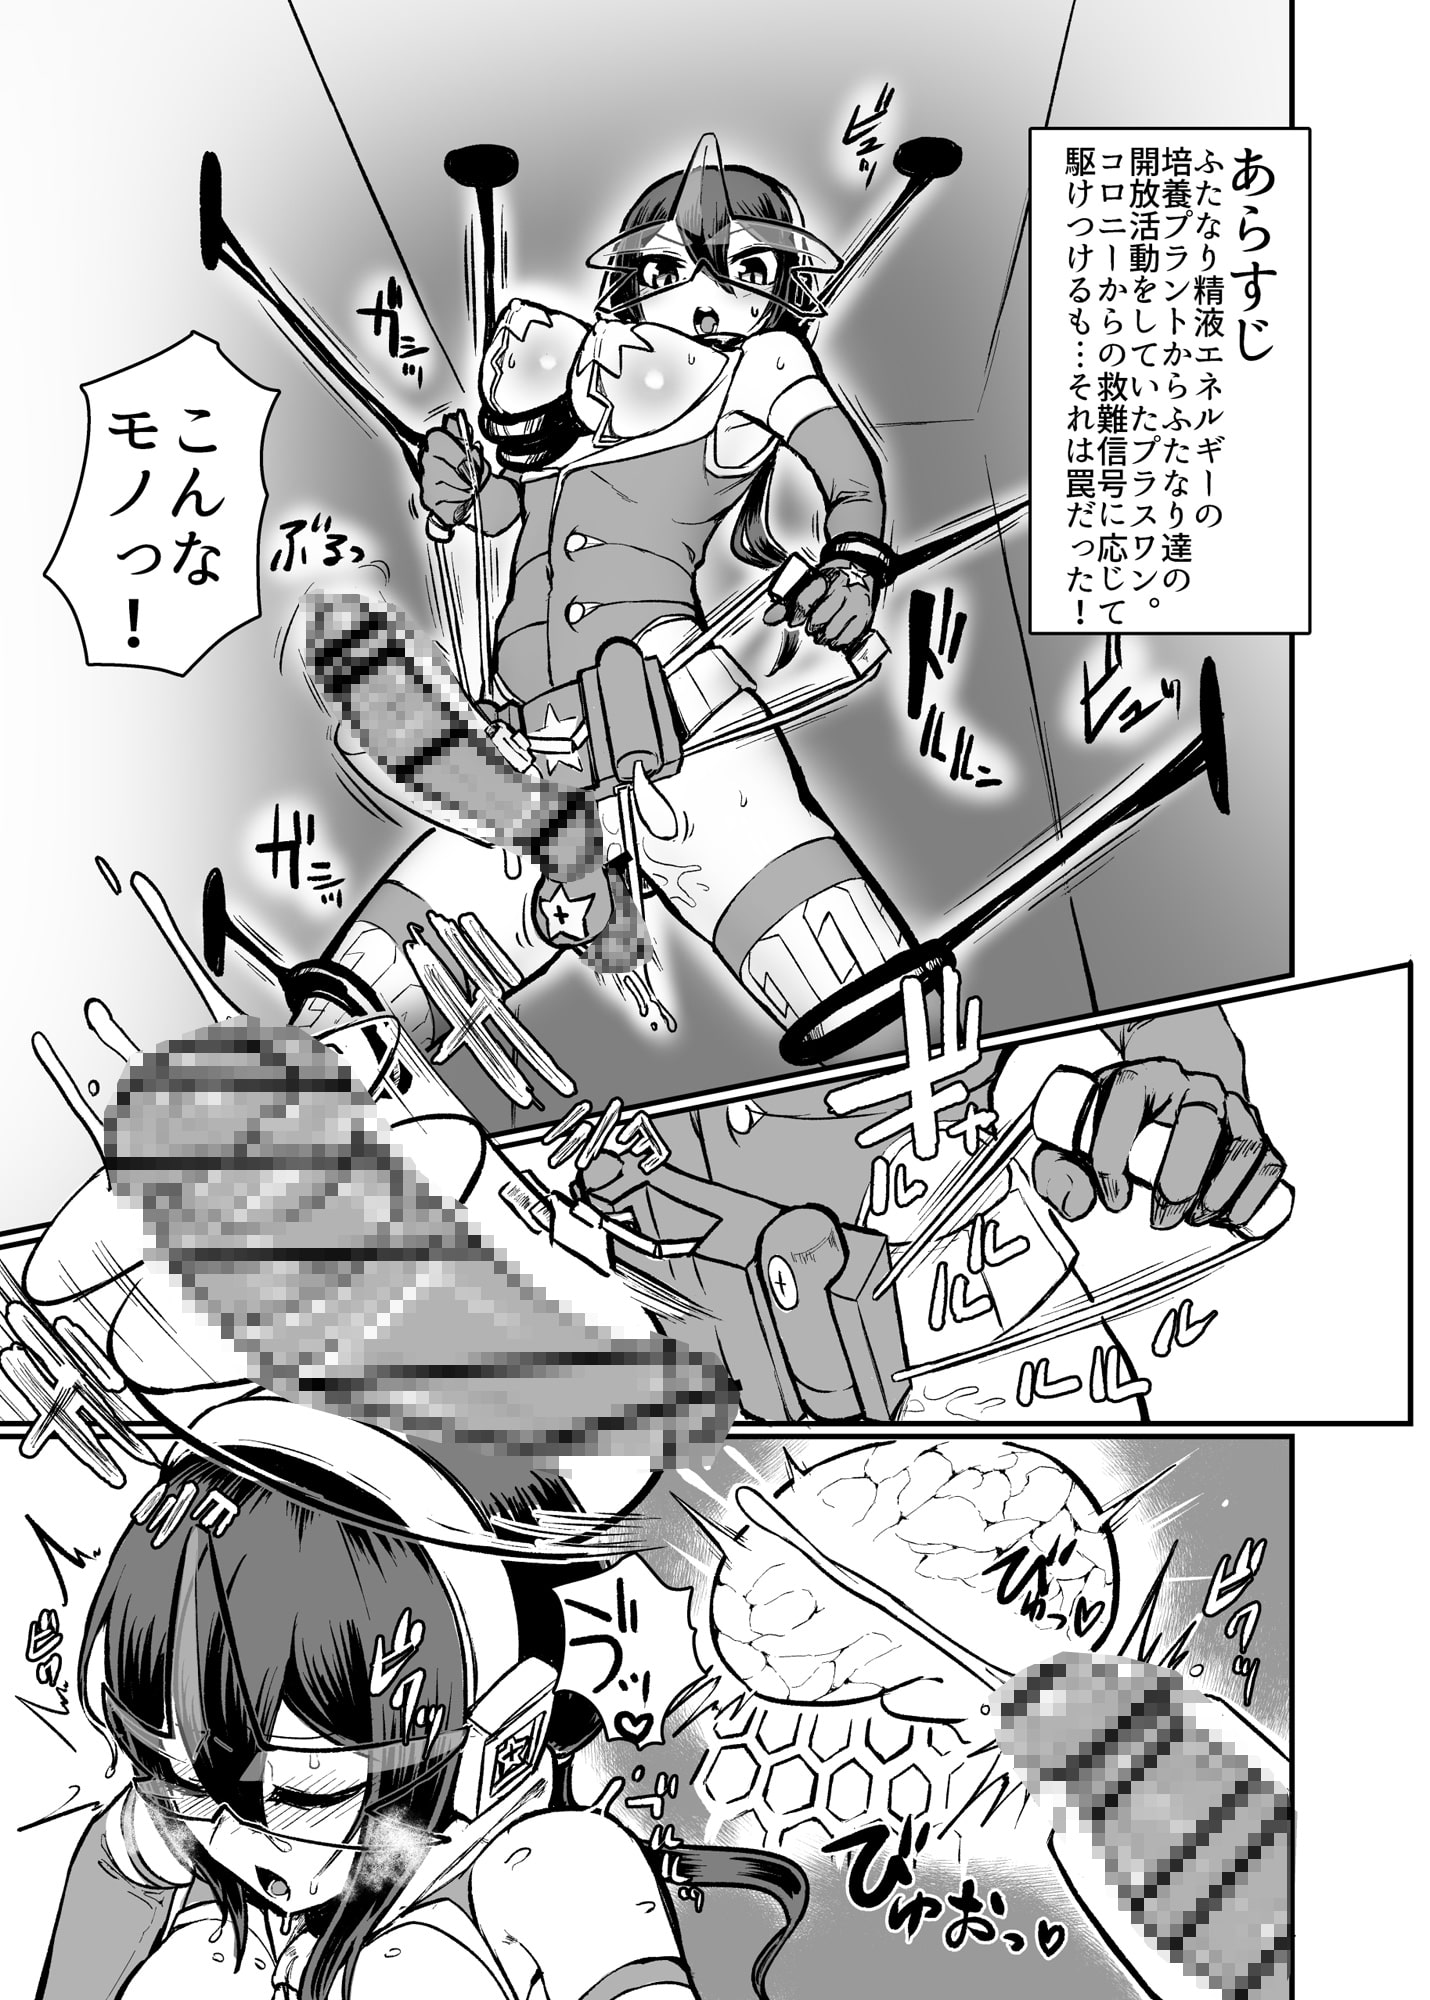 錬金星颯プラスワンII 敗北搾精編/埋伏覚醒編